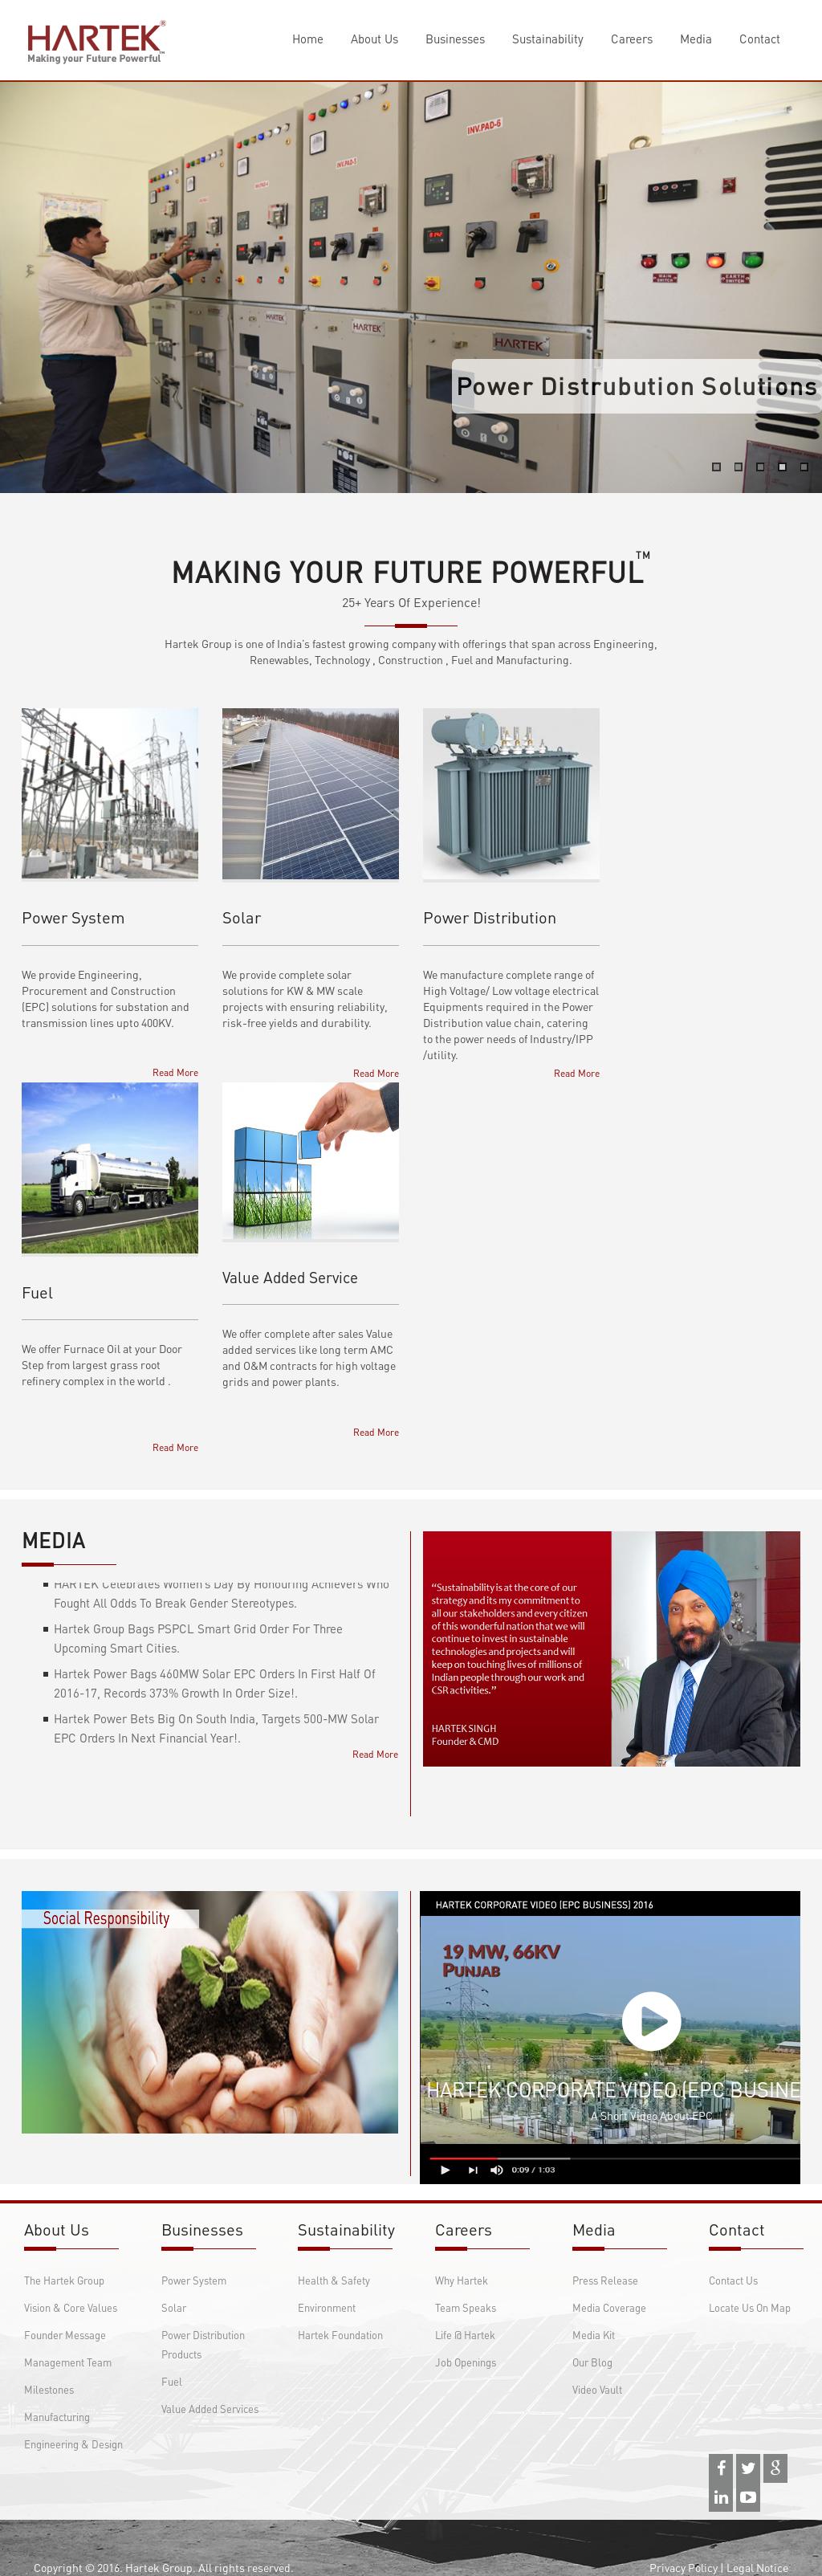 Hartekgroup website history Hartekgroup Competitors Revenue and